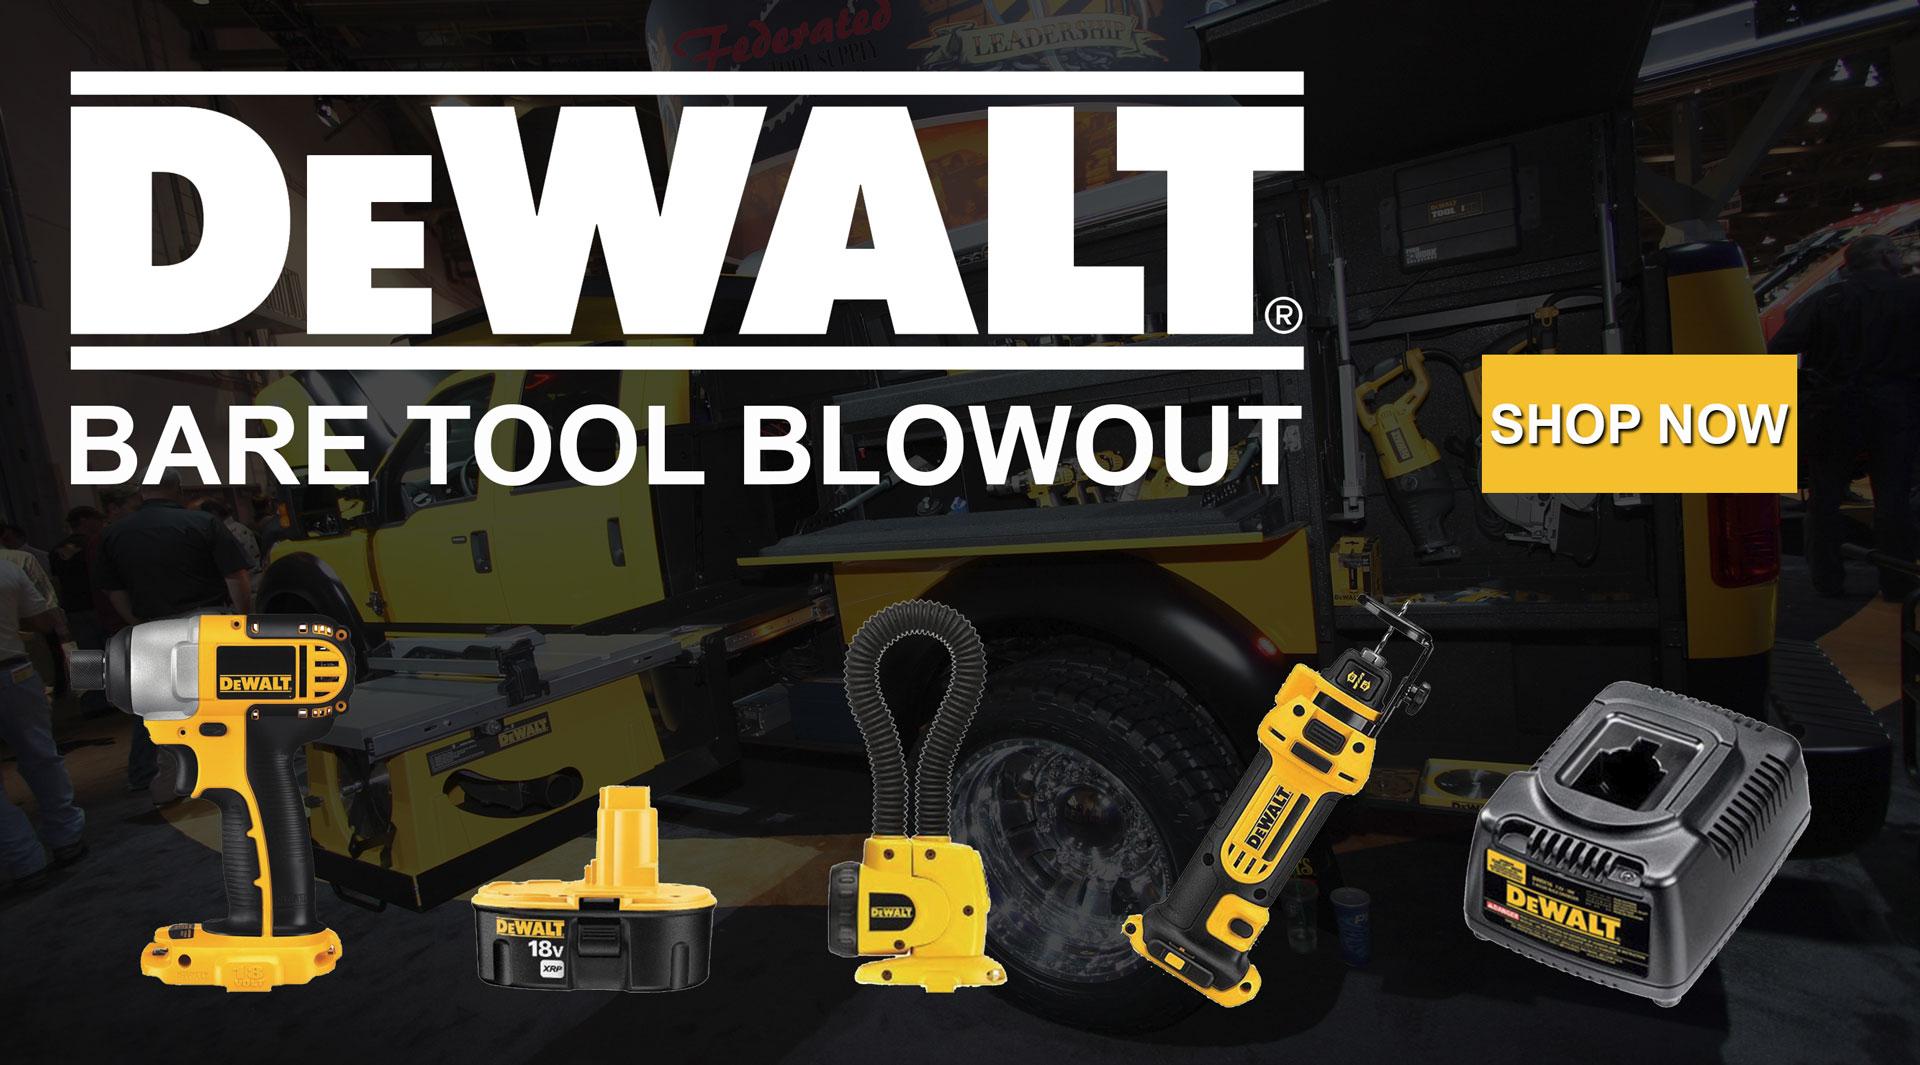 DeWALT bare tool blowout